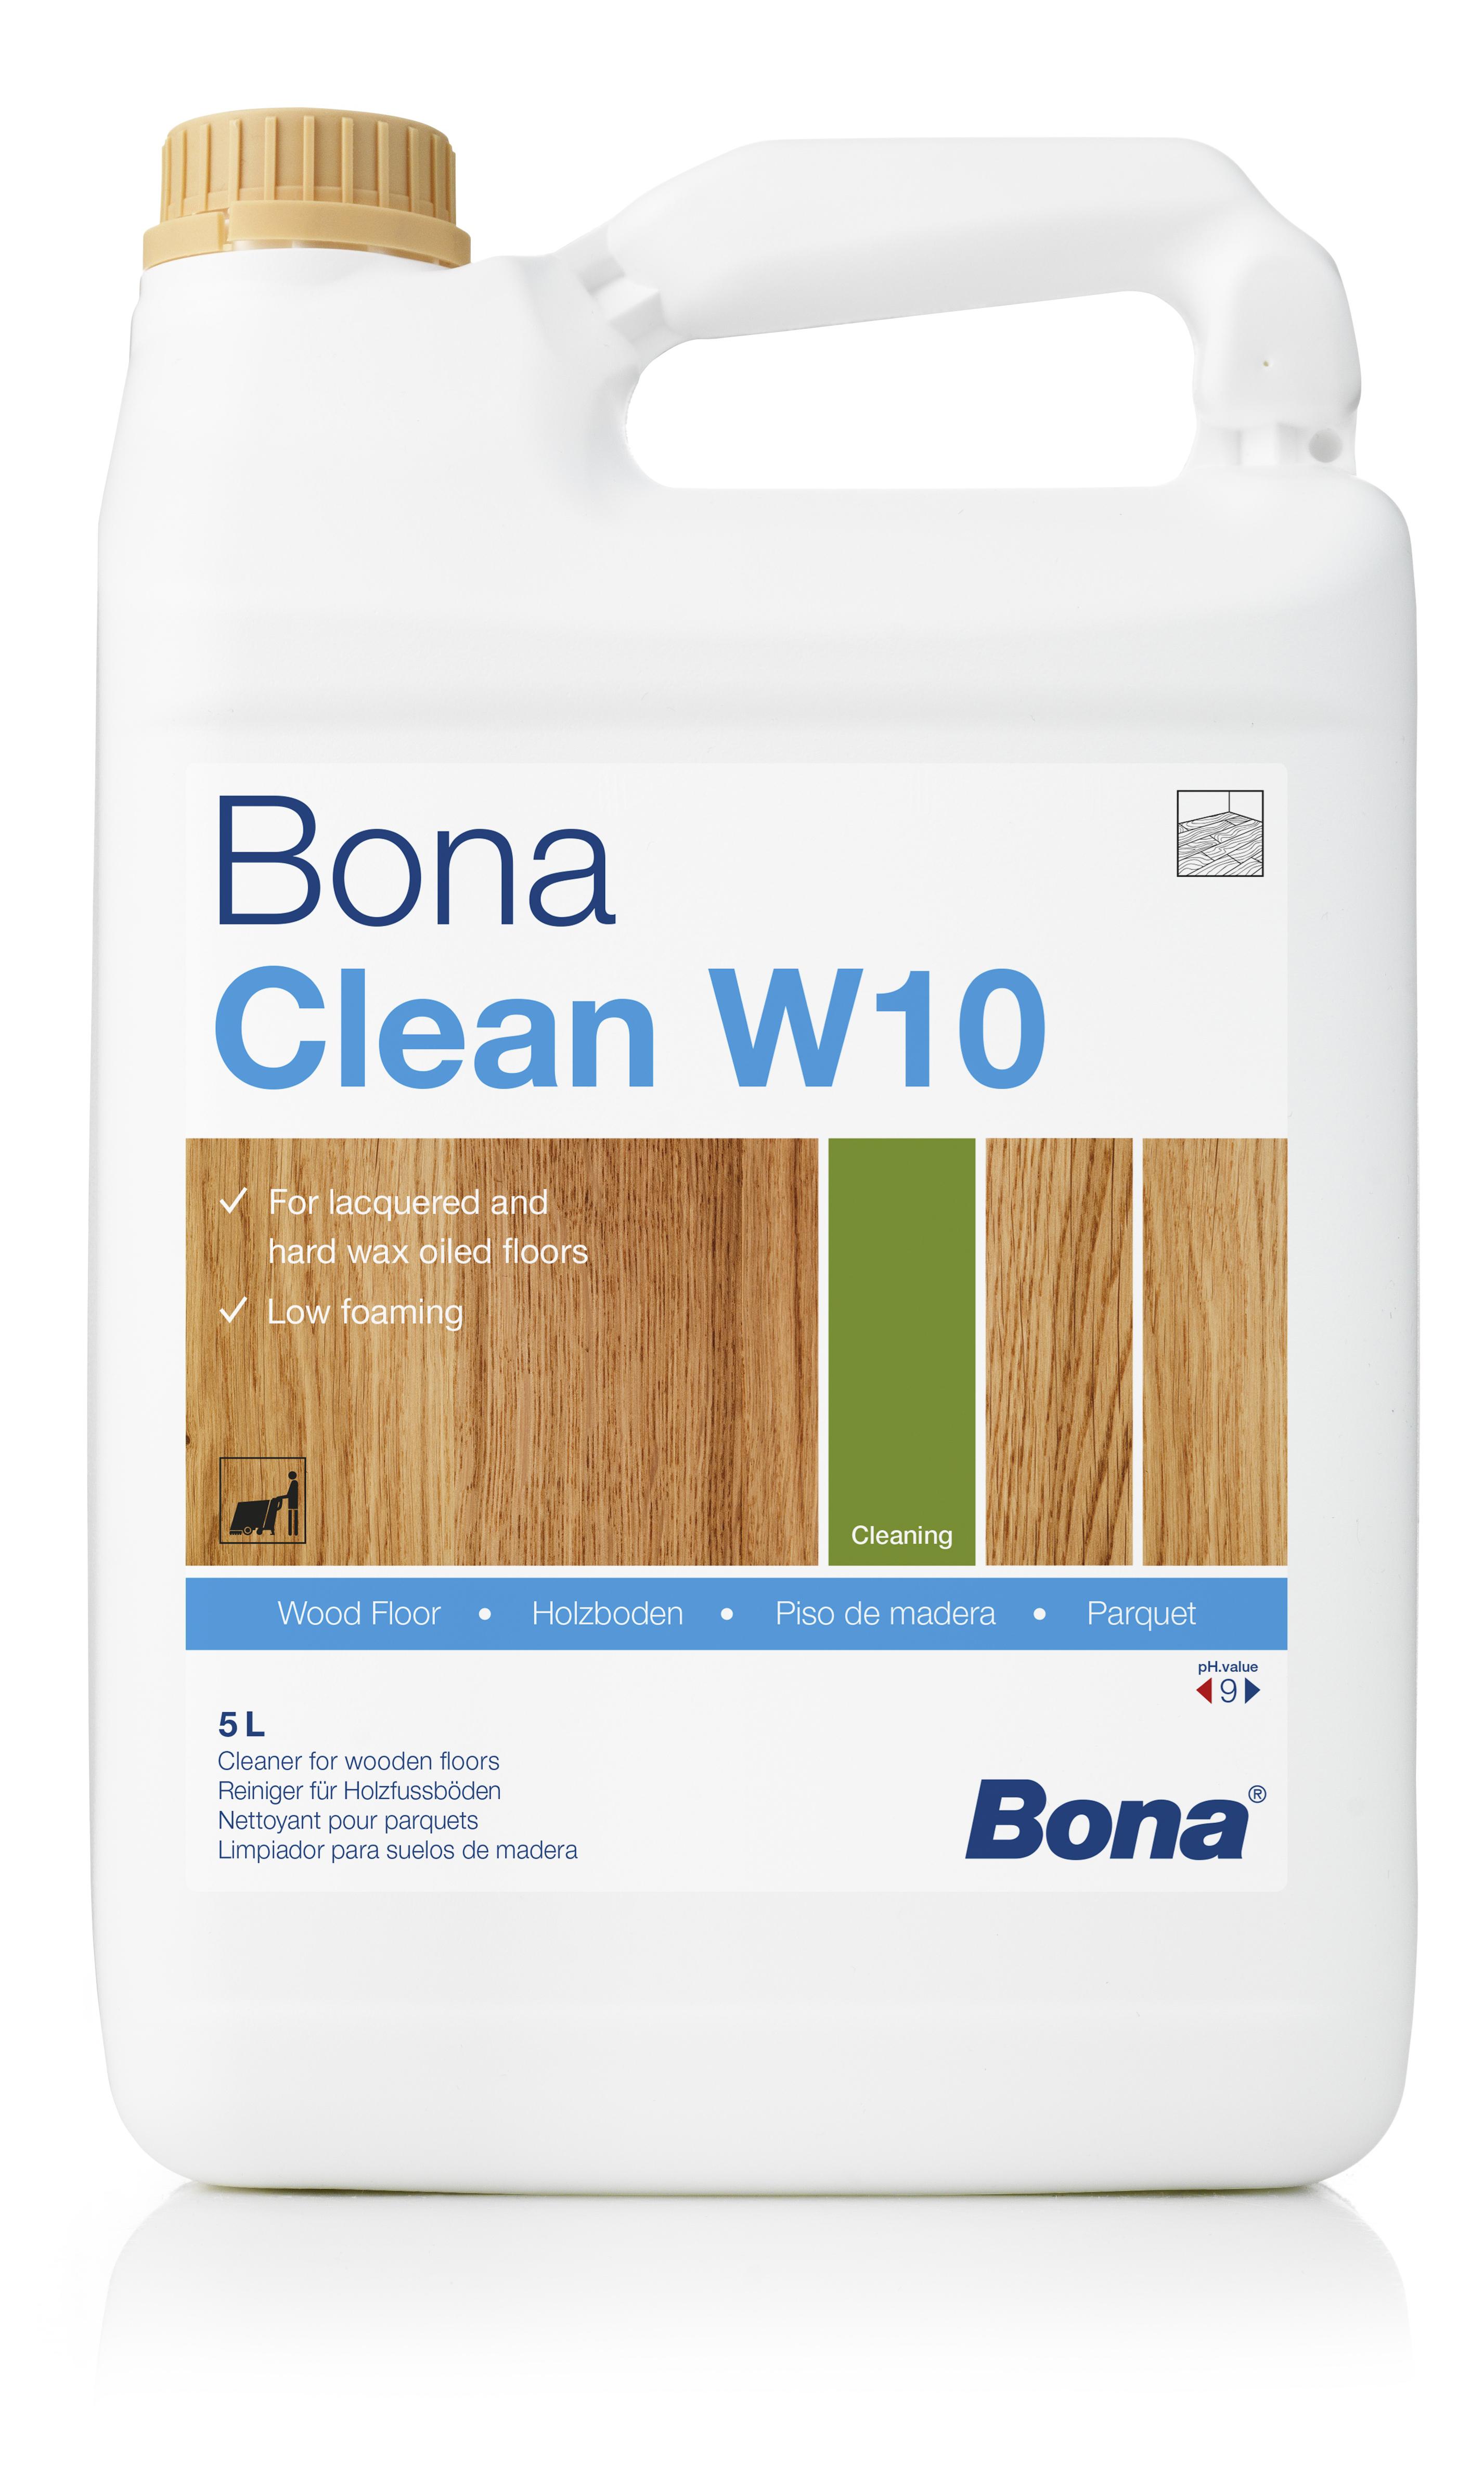 Bona Clean W10